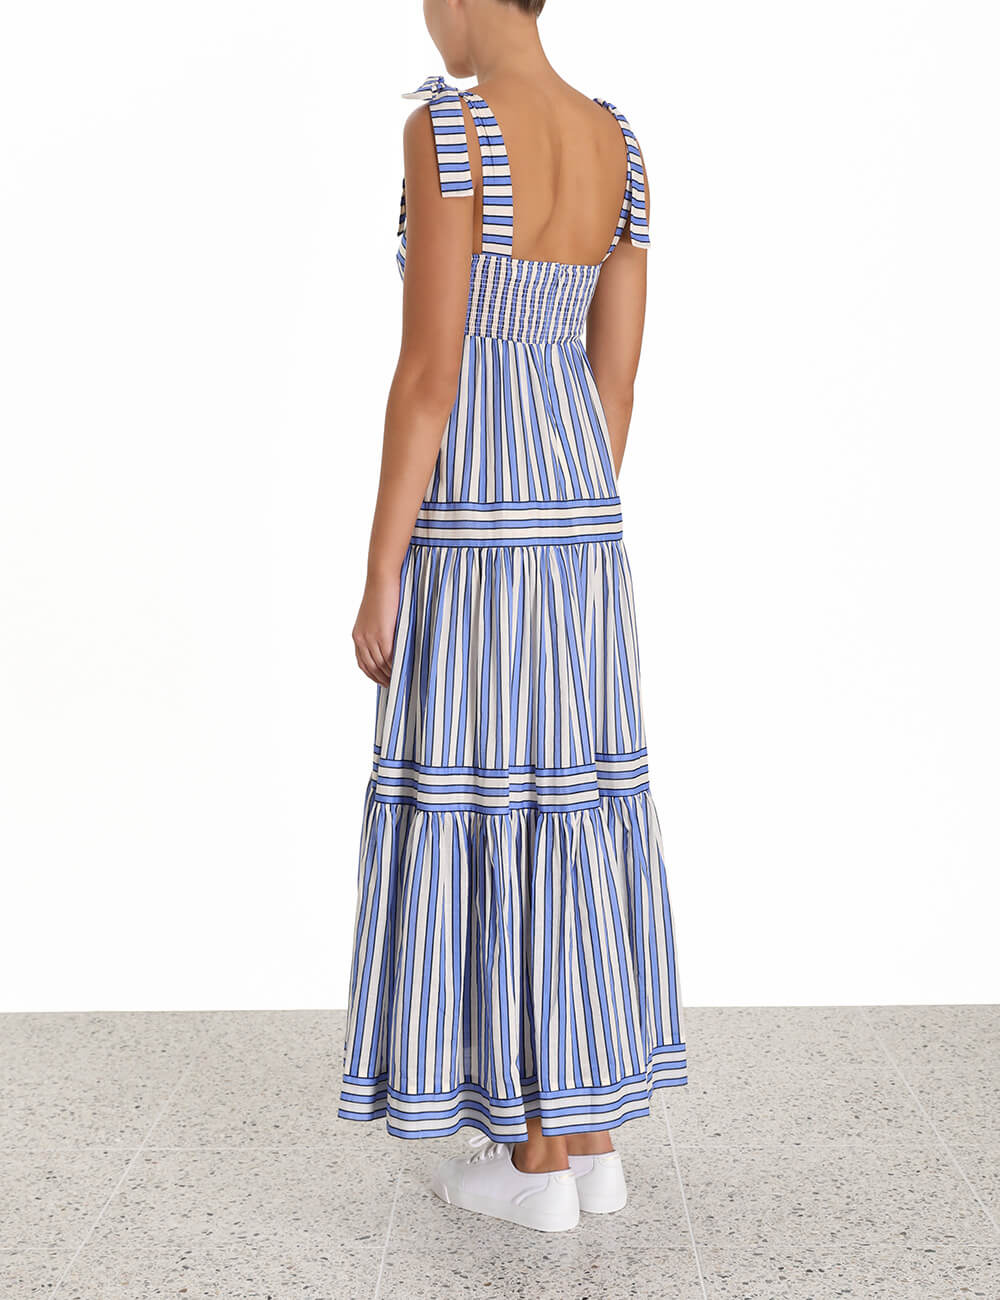 Verity Stripe Tiered Tie Dress